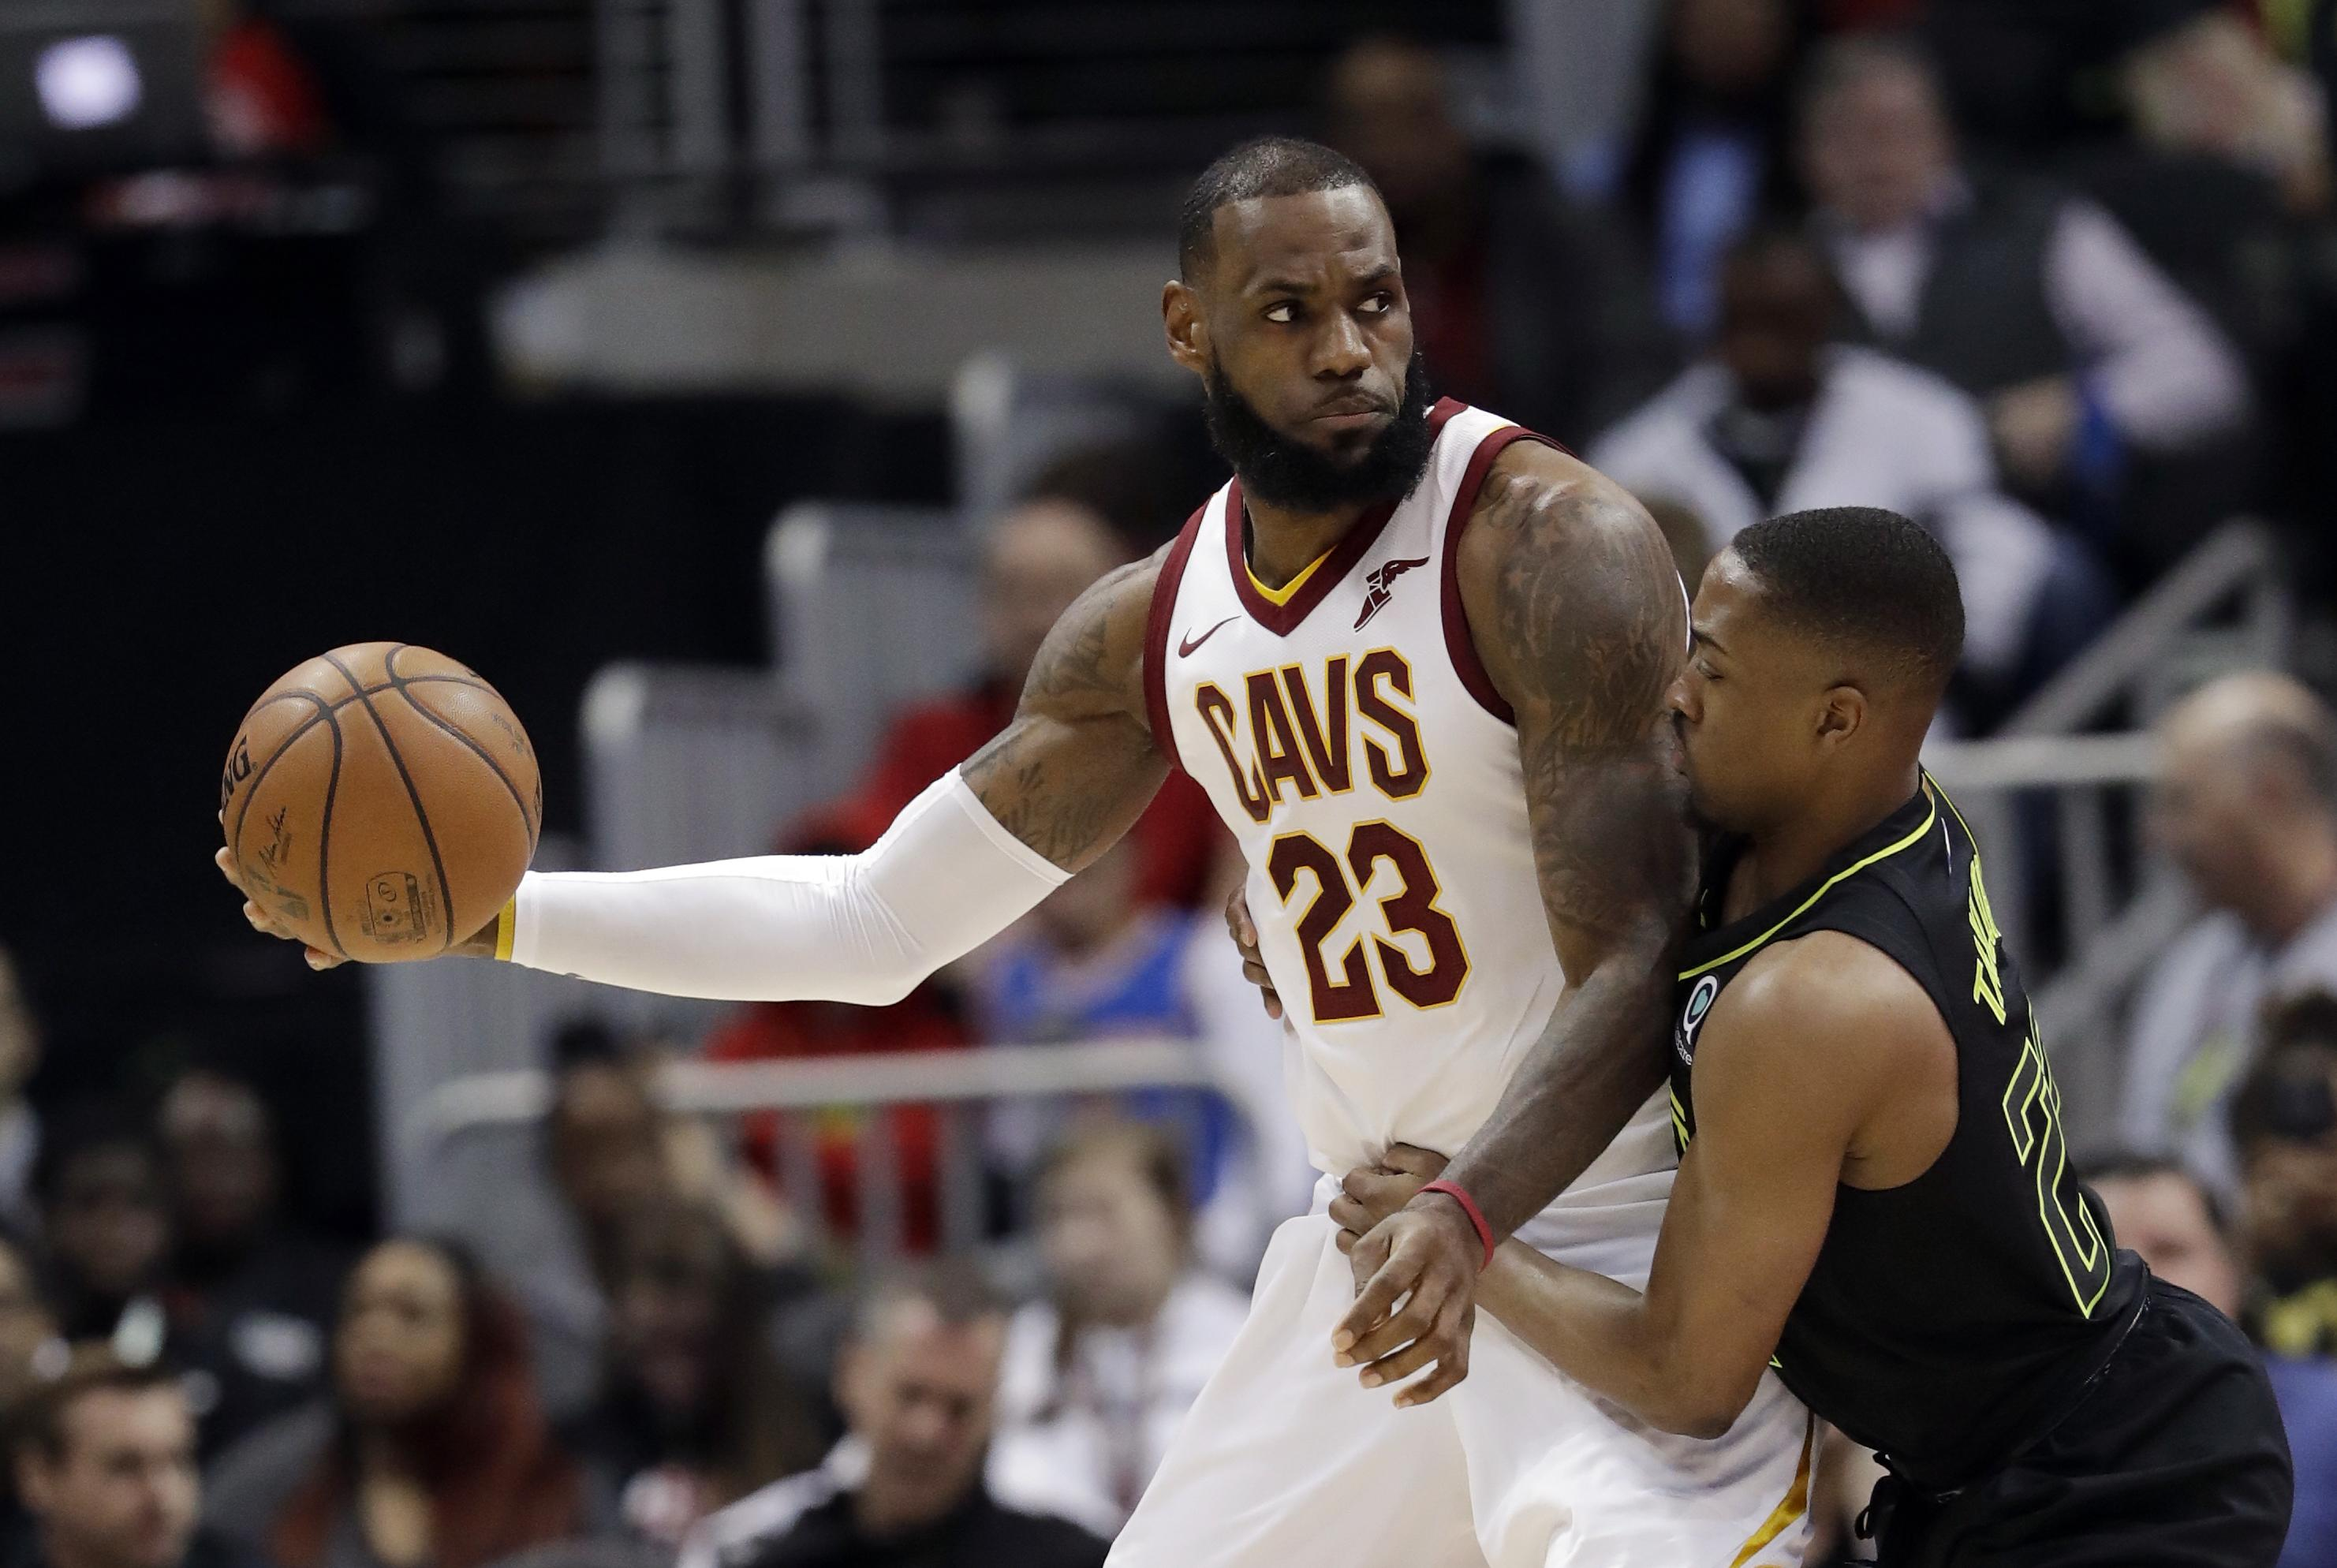 a74defb72513 Cleveland Cavaliers forward LeBron James (23) works against Atlanta Hawks  guard Isaiah Taylor (